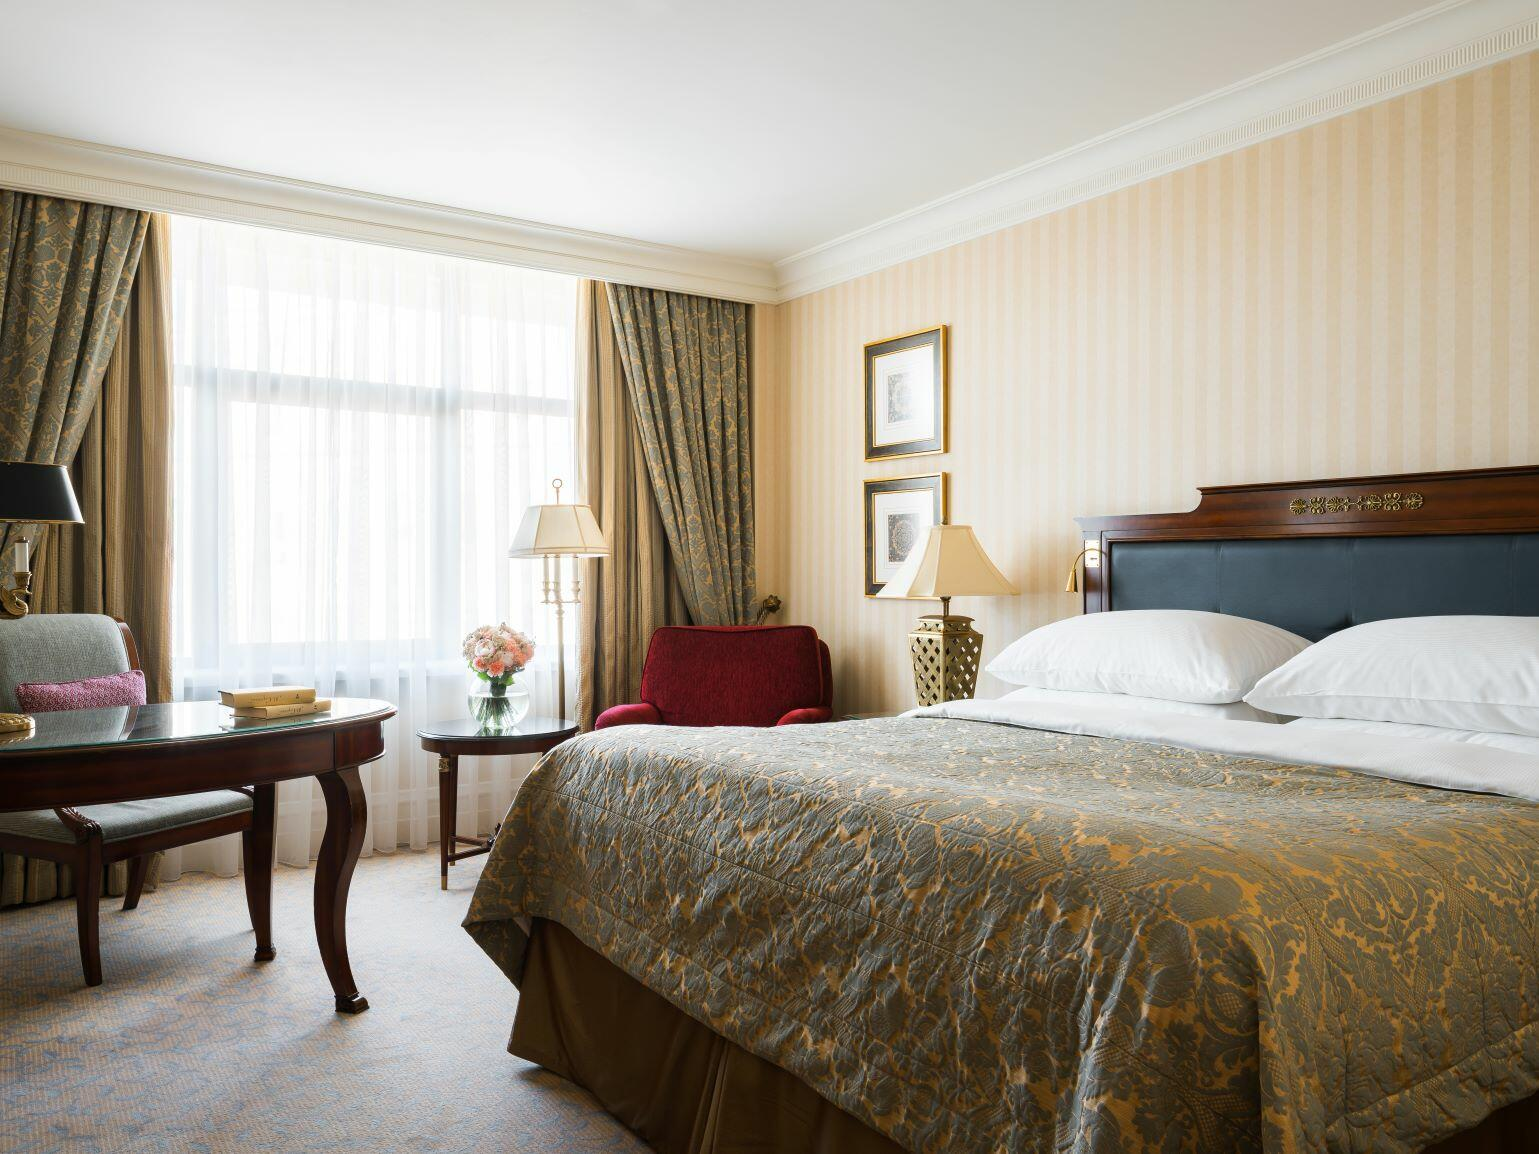 Best deluxe room in Intercontinental Kyiv hotel